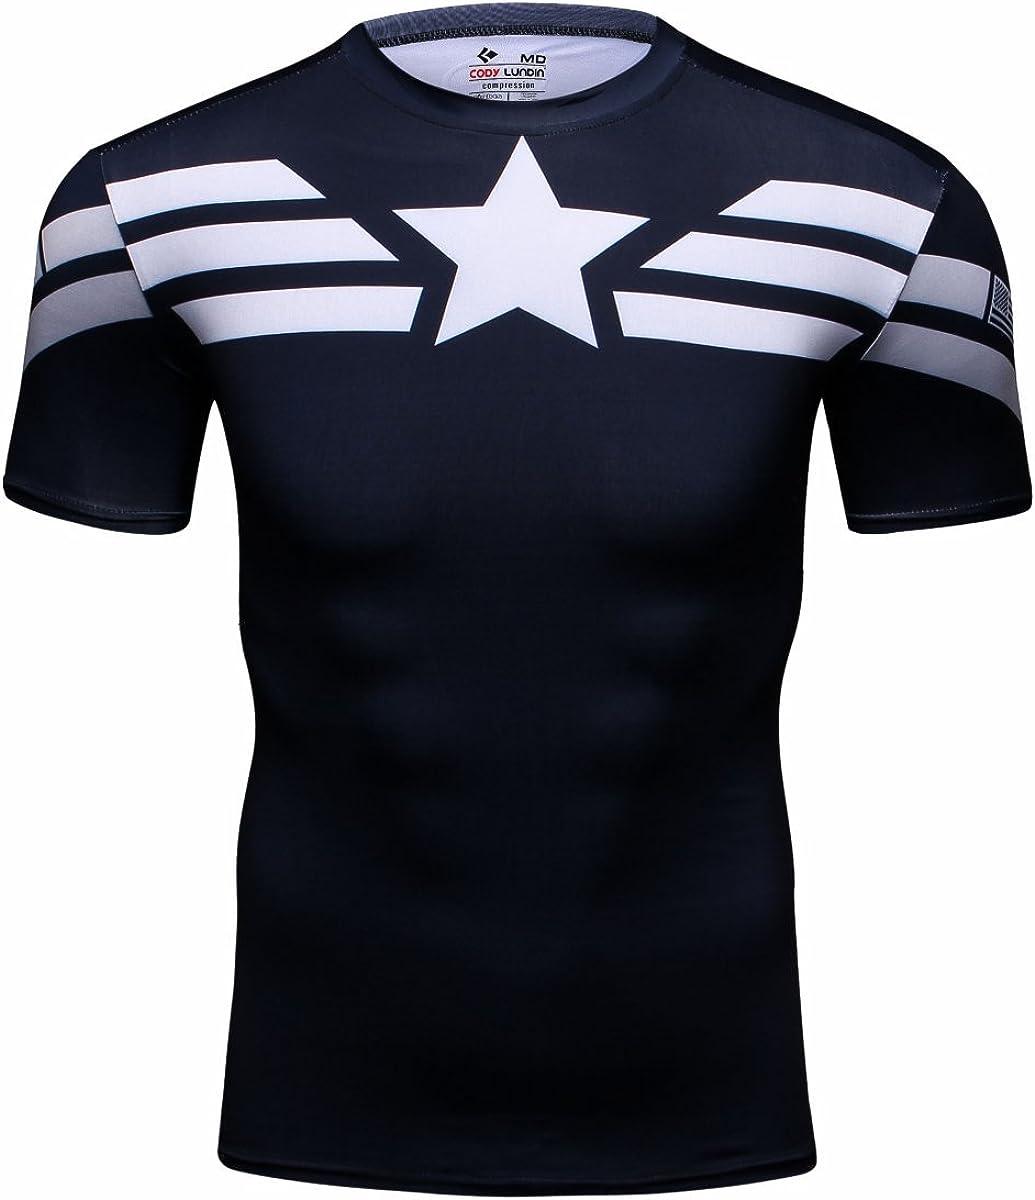 Red Plume Men's Film Super-Hero Series Compression Sports Shirt Running Short Sleeve Tee